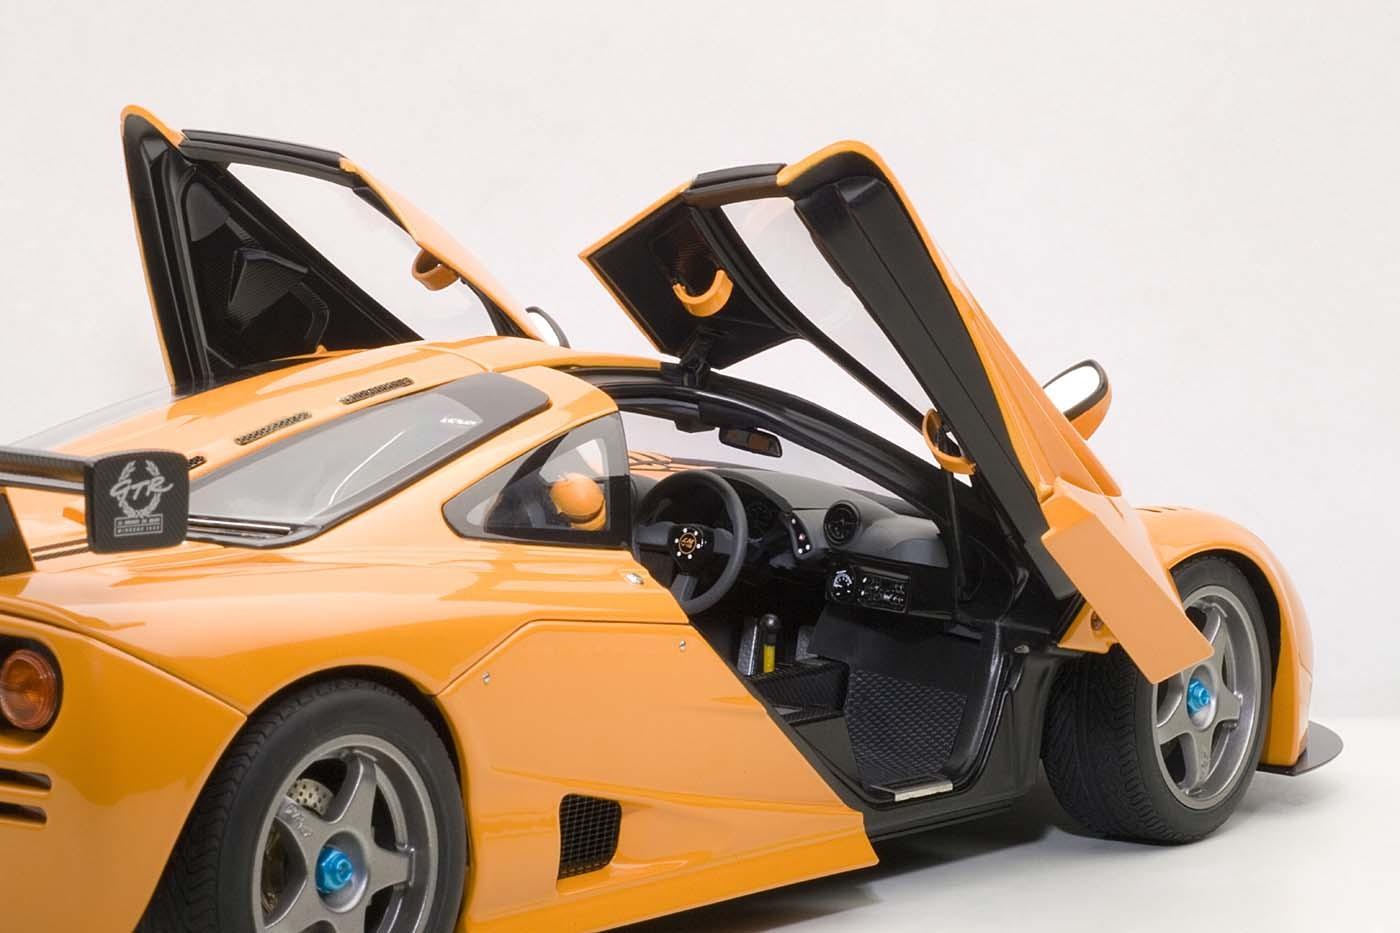 autoart die-cast model mclaren f1 lm edition historic orange 76011